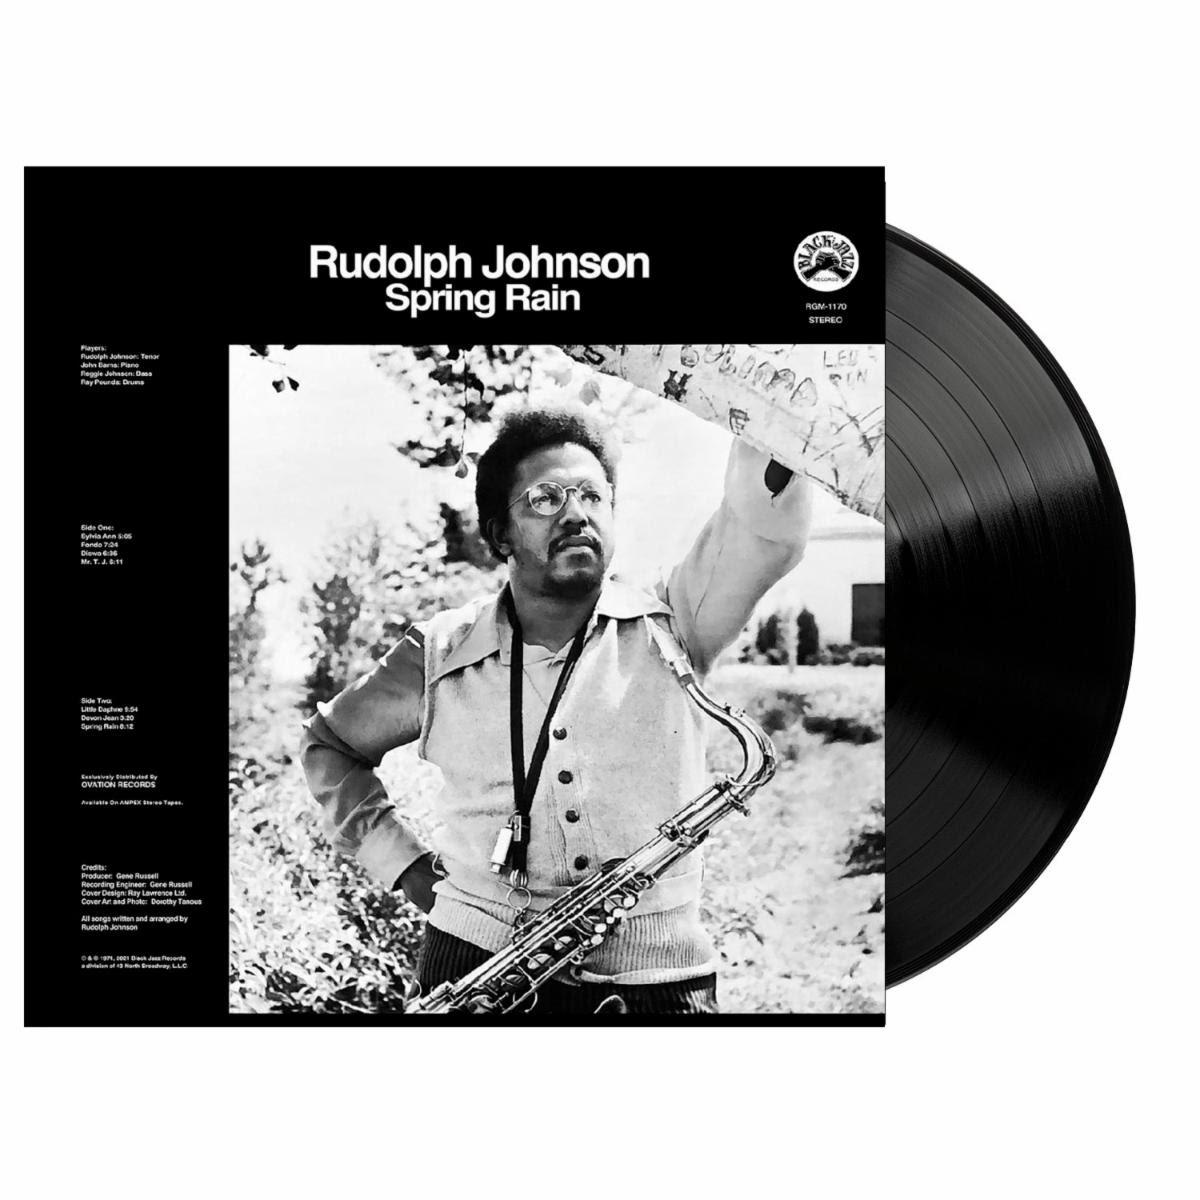 Rudolph Johnson Spring Rain Black Vinyl LP Packshot